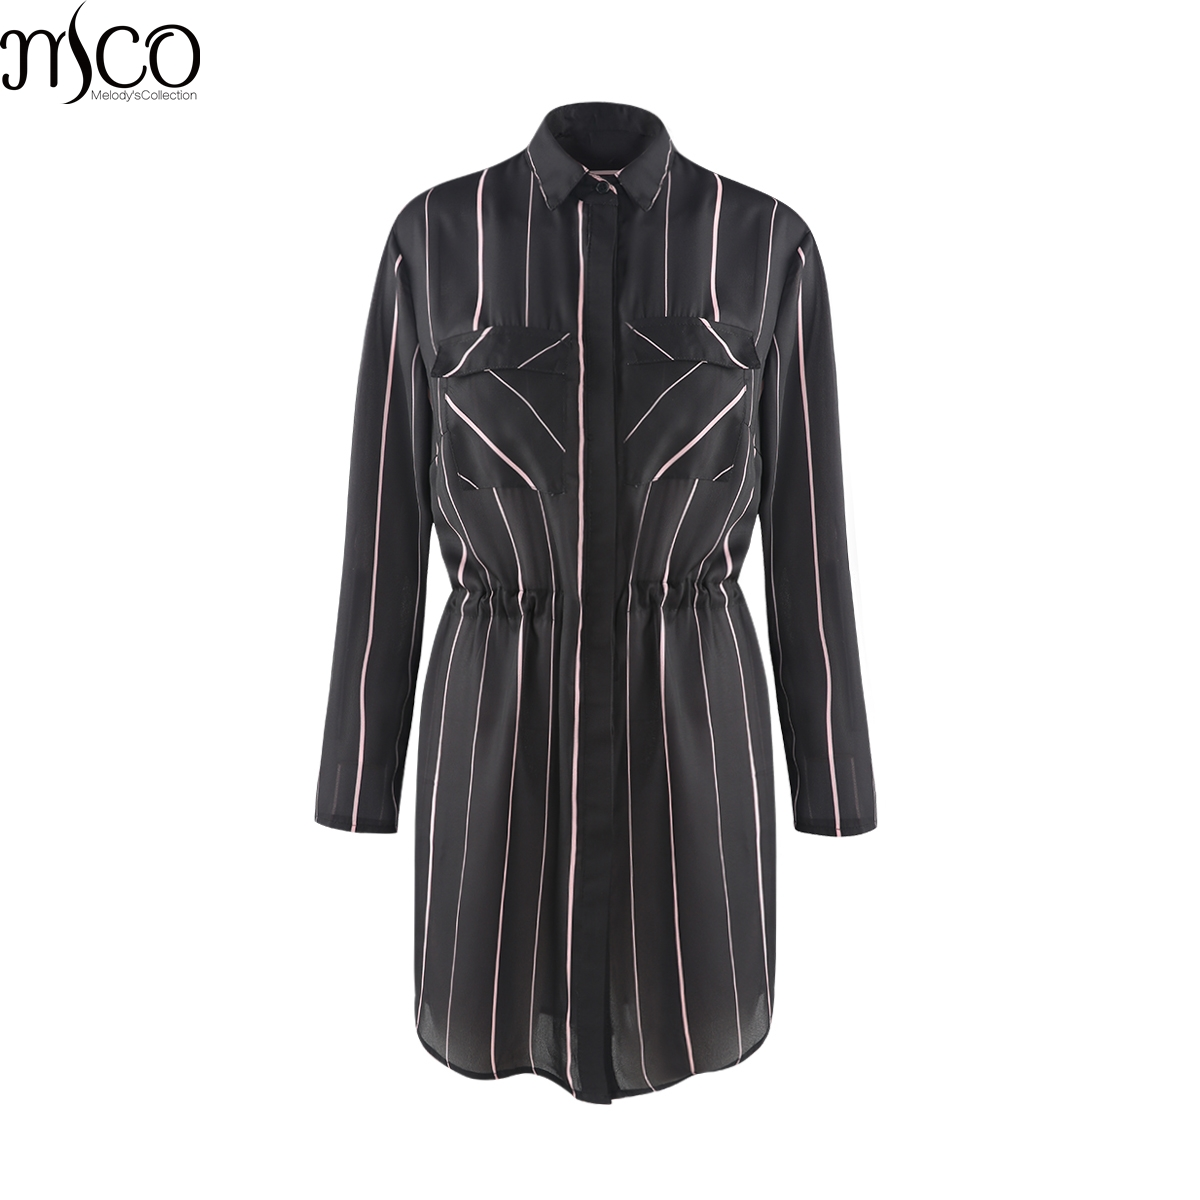 MCO 2018 Spring Simple Tie Waist Plus Size OL Stripe Shirt Casual Oversize Long Office Ladies Blouse Basic Big Women Top 6xl 7xl